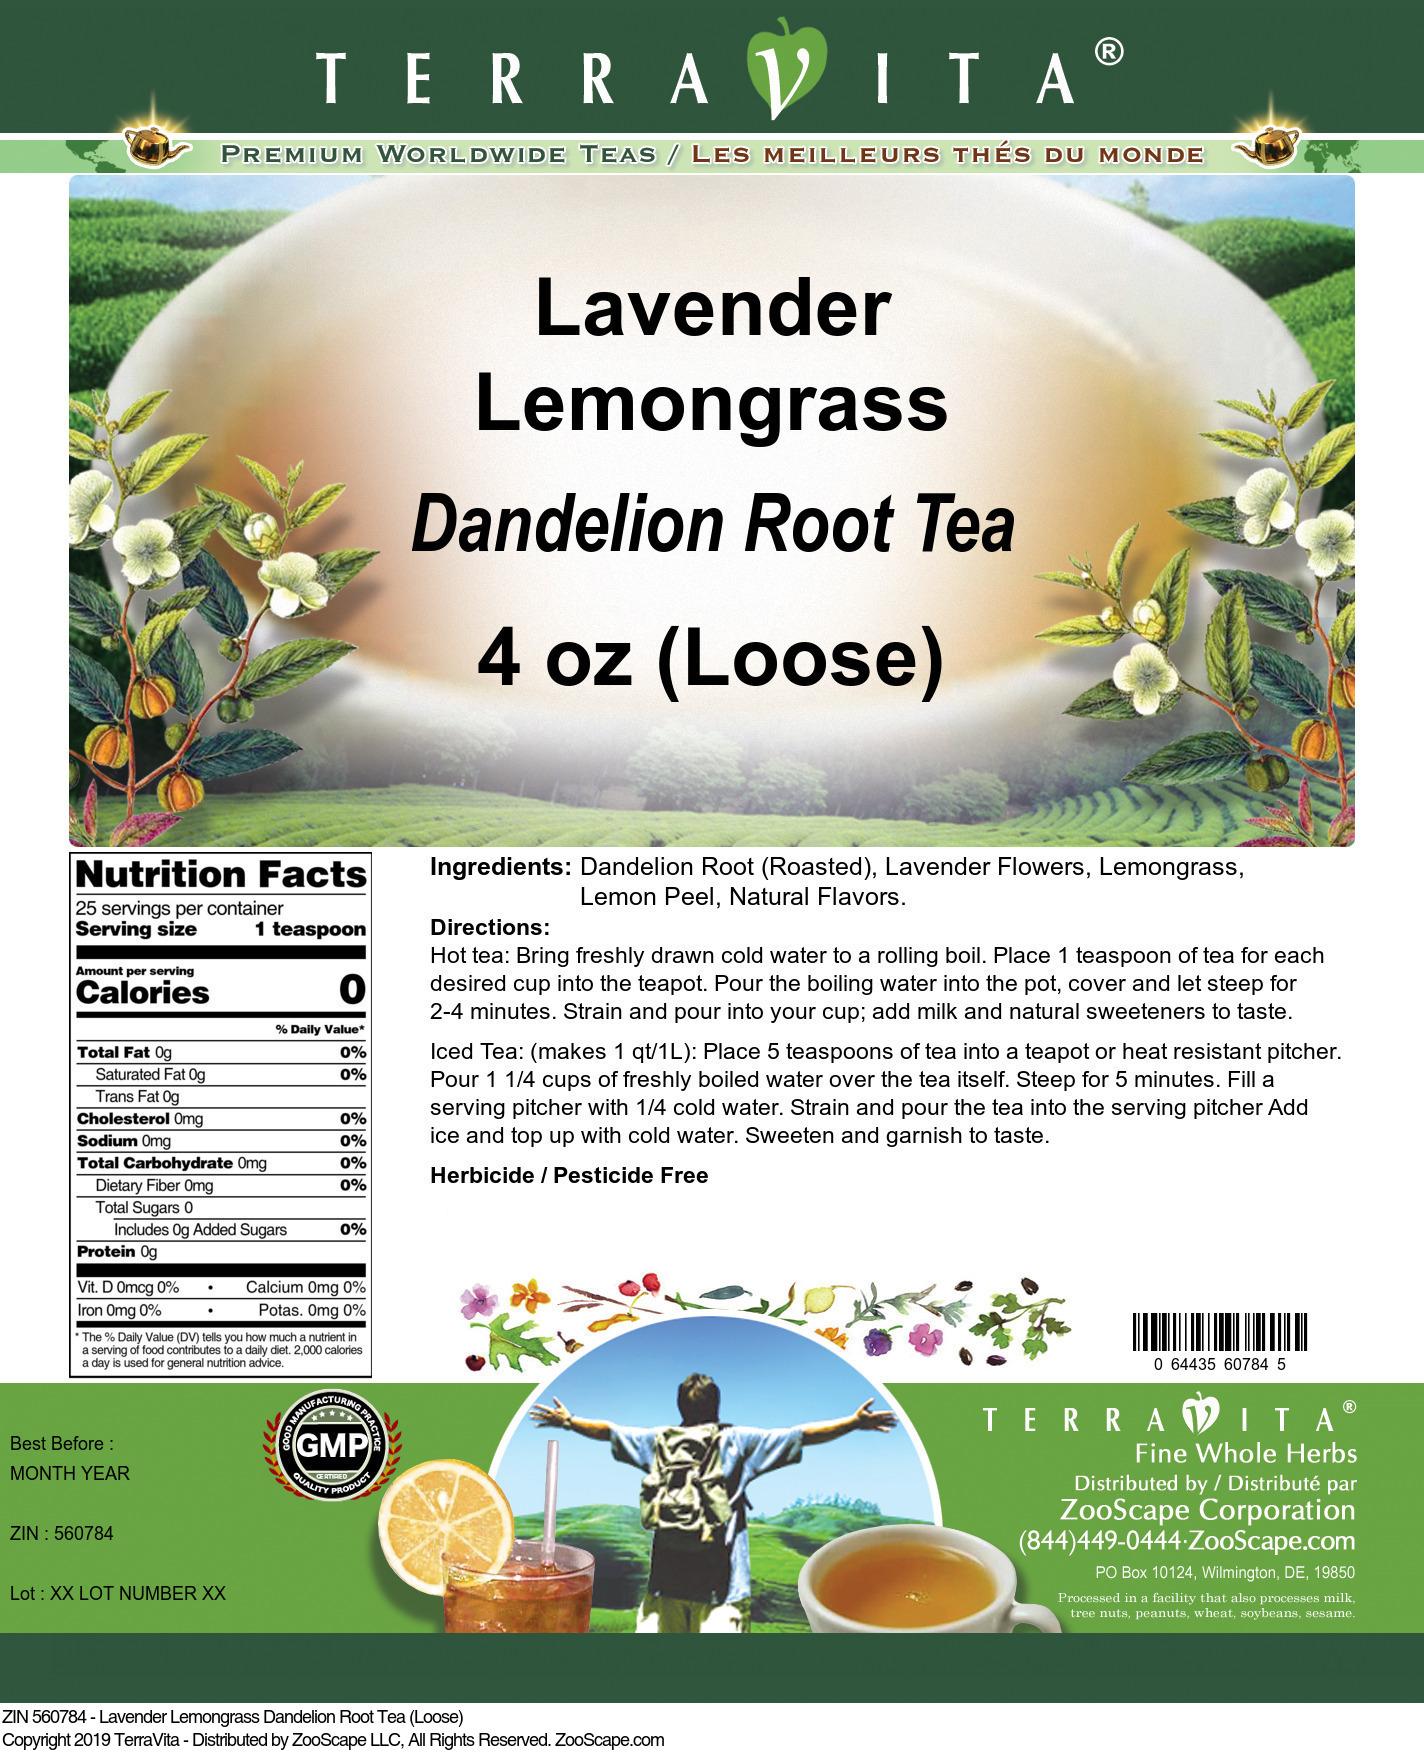 Lavender Lemongrass Dandelion Root Tea (Loose)